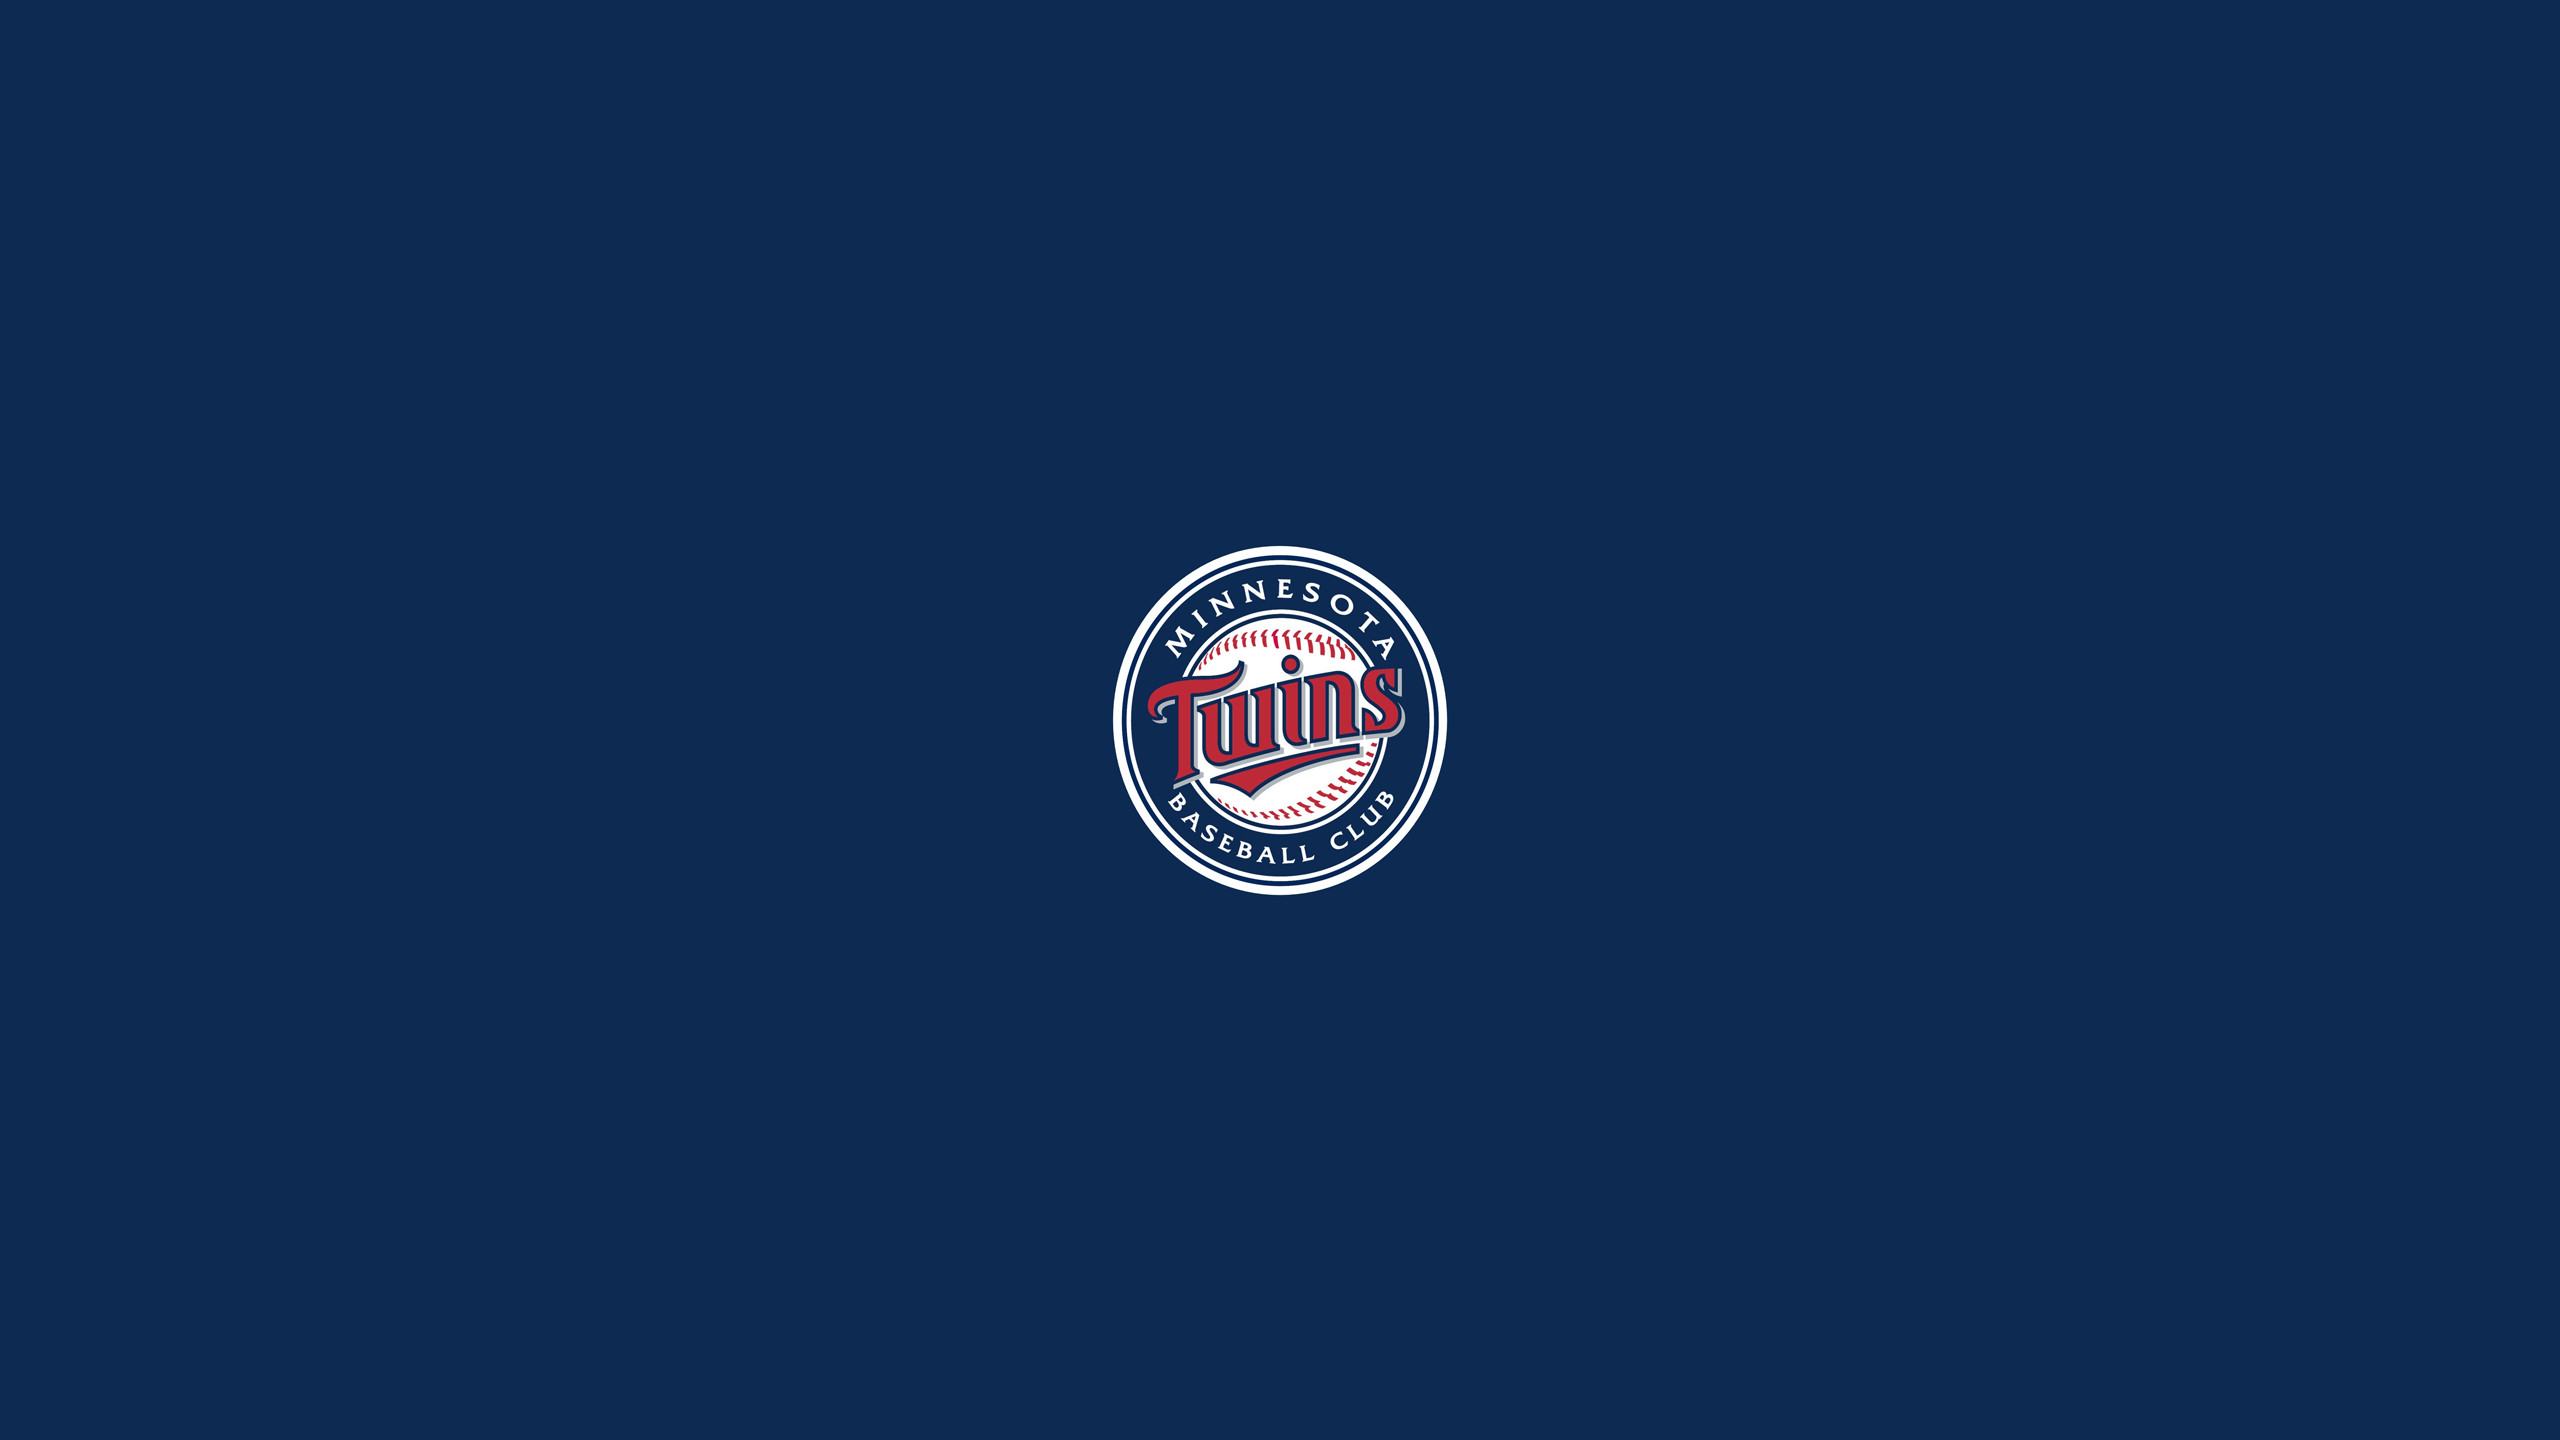 MINNESOTA TWINS mlb baseball (1) wallpaper | | 232140 .